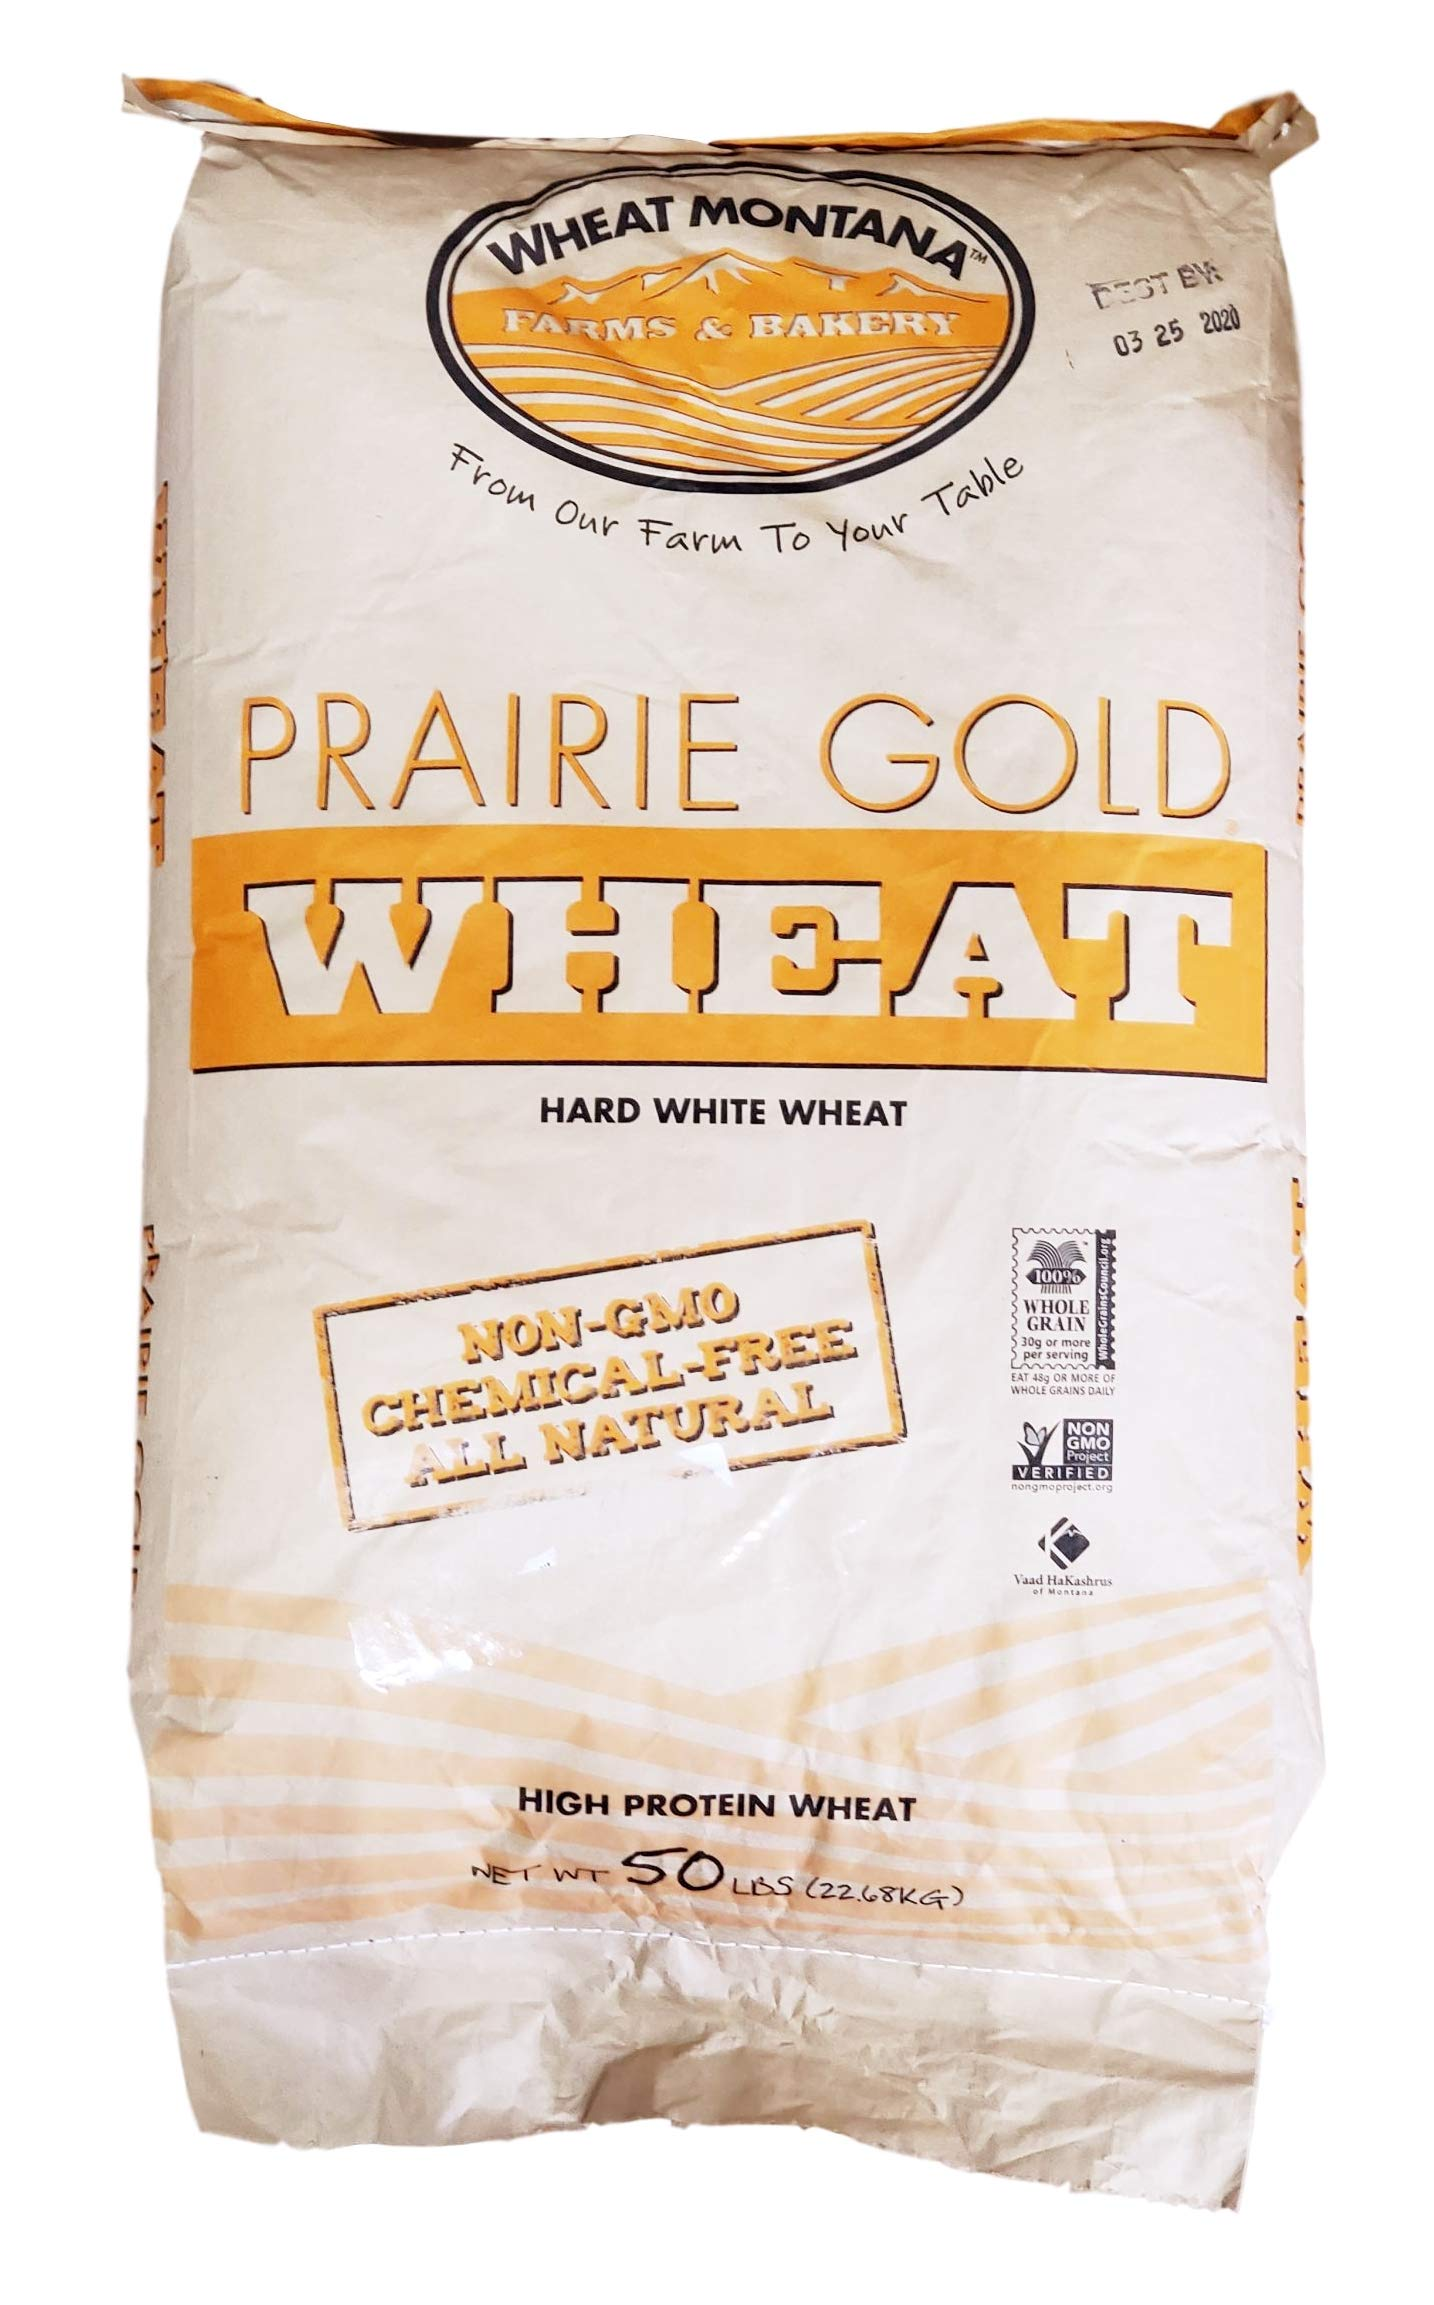 Wheat Montana - Prairie Gold Wheat Berries - 1 pack - 50lb bag by Wheat Montana